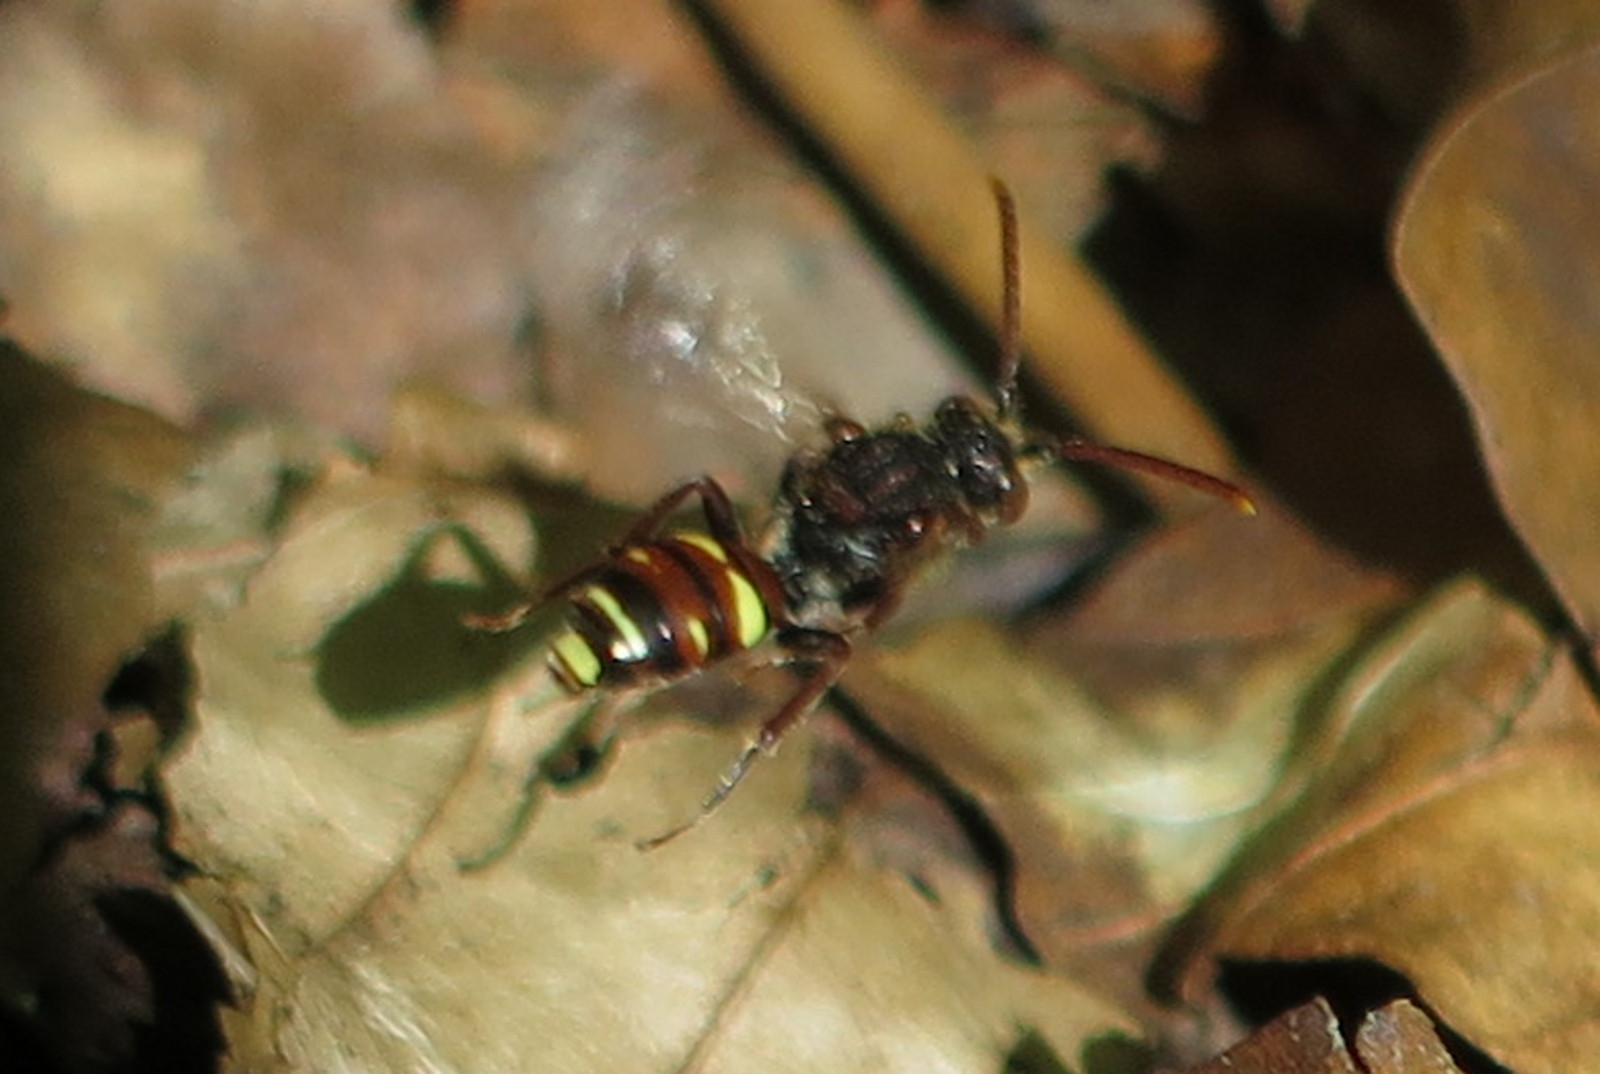 Foto/billede af Nomada ruficornis (Nomada ruficornis)